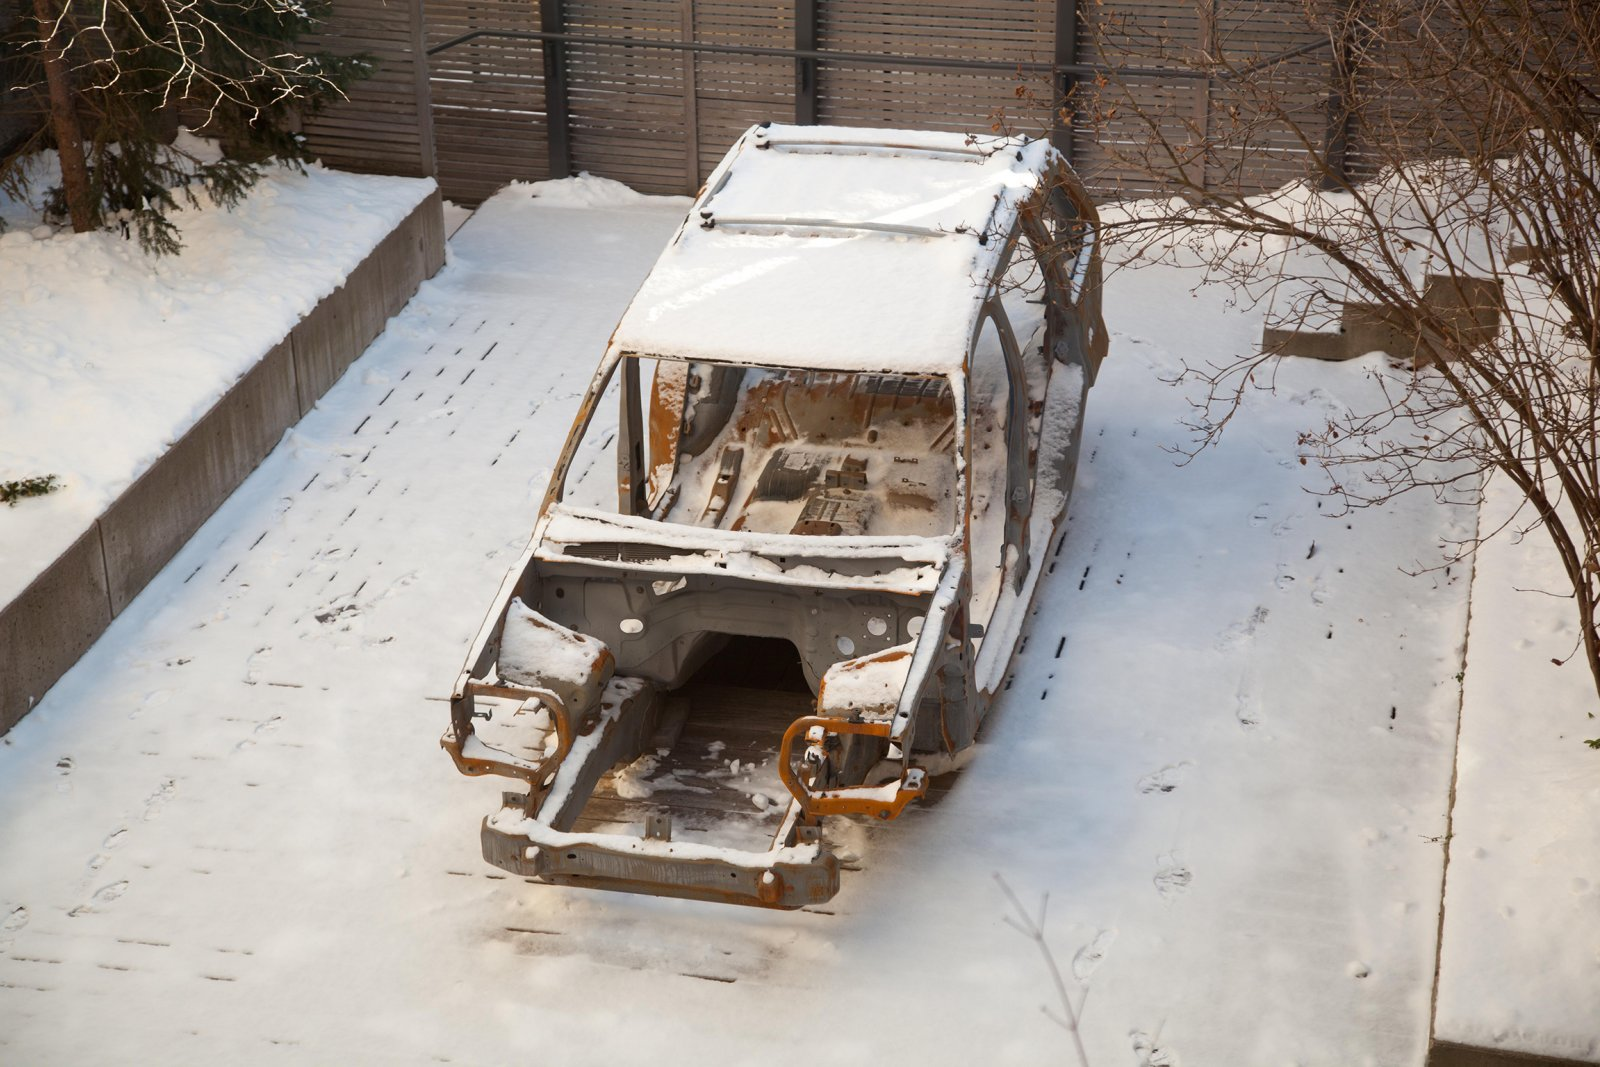 Duane Linklater,2005 Grand Jeep Cherokee, 2013, steel frame of artist's vehicle. dimensions variable